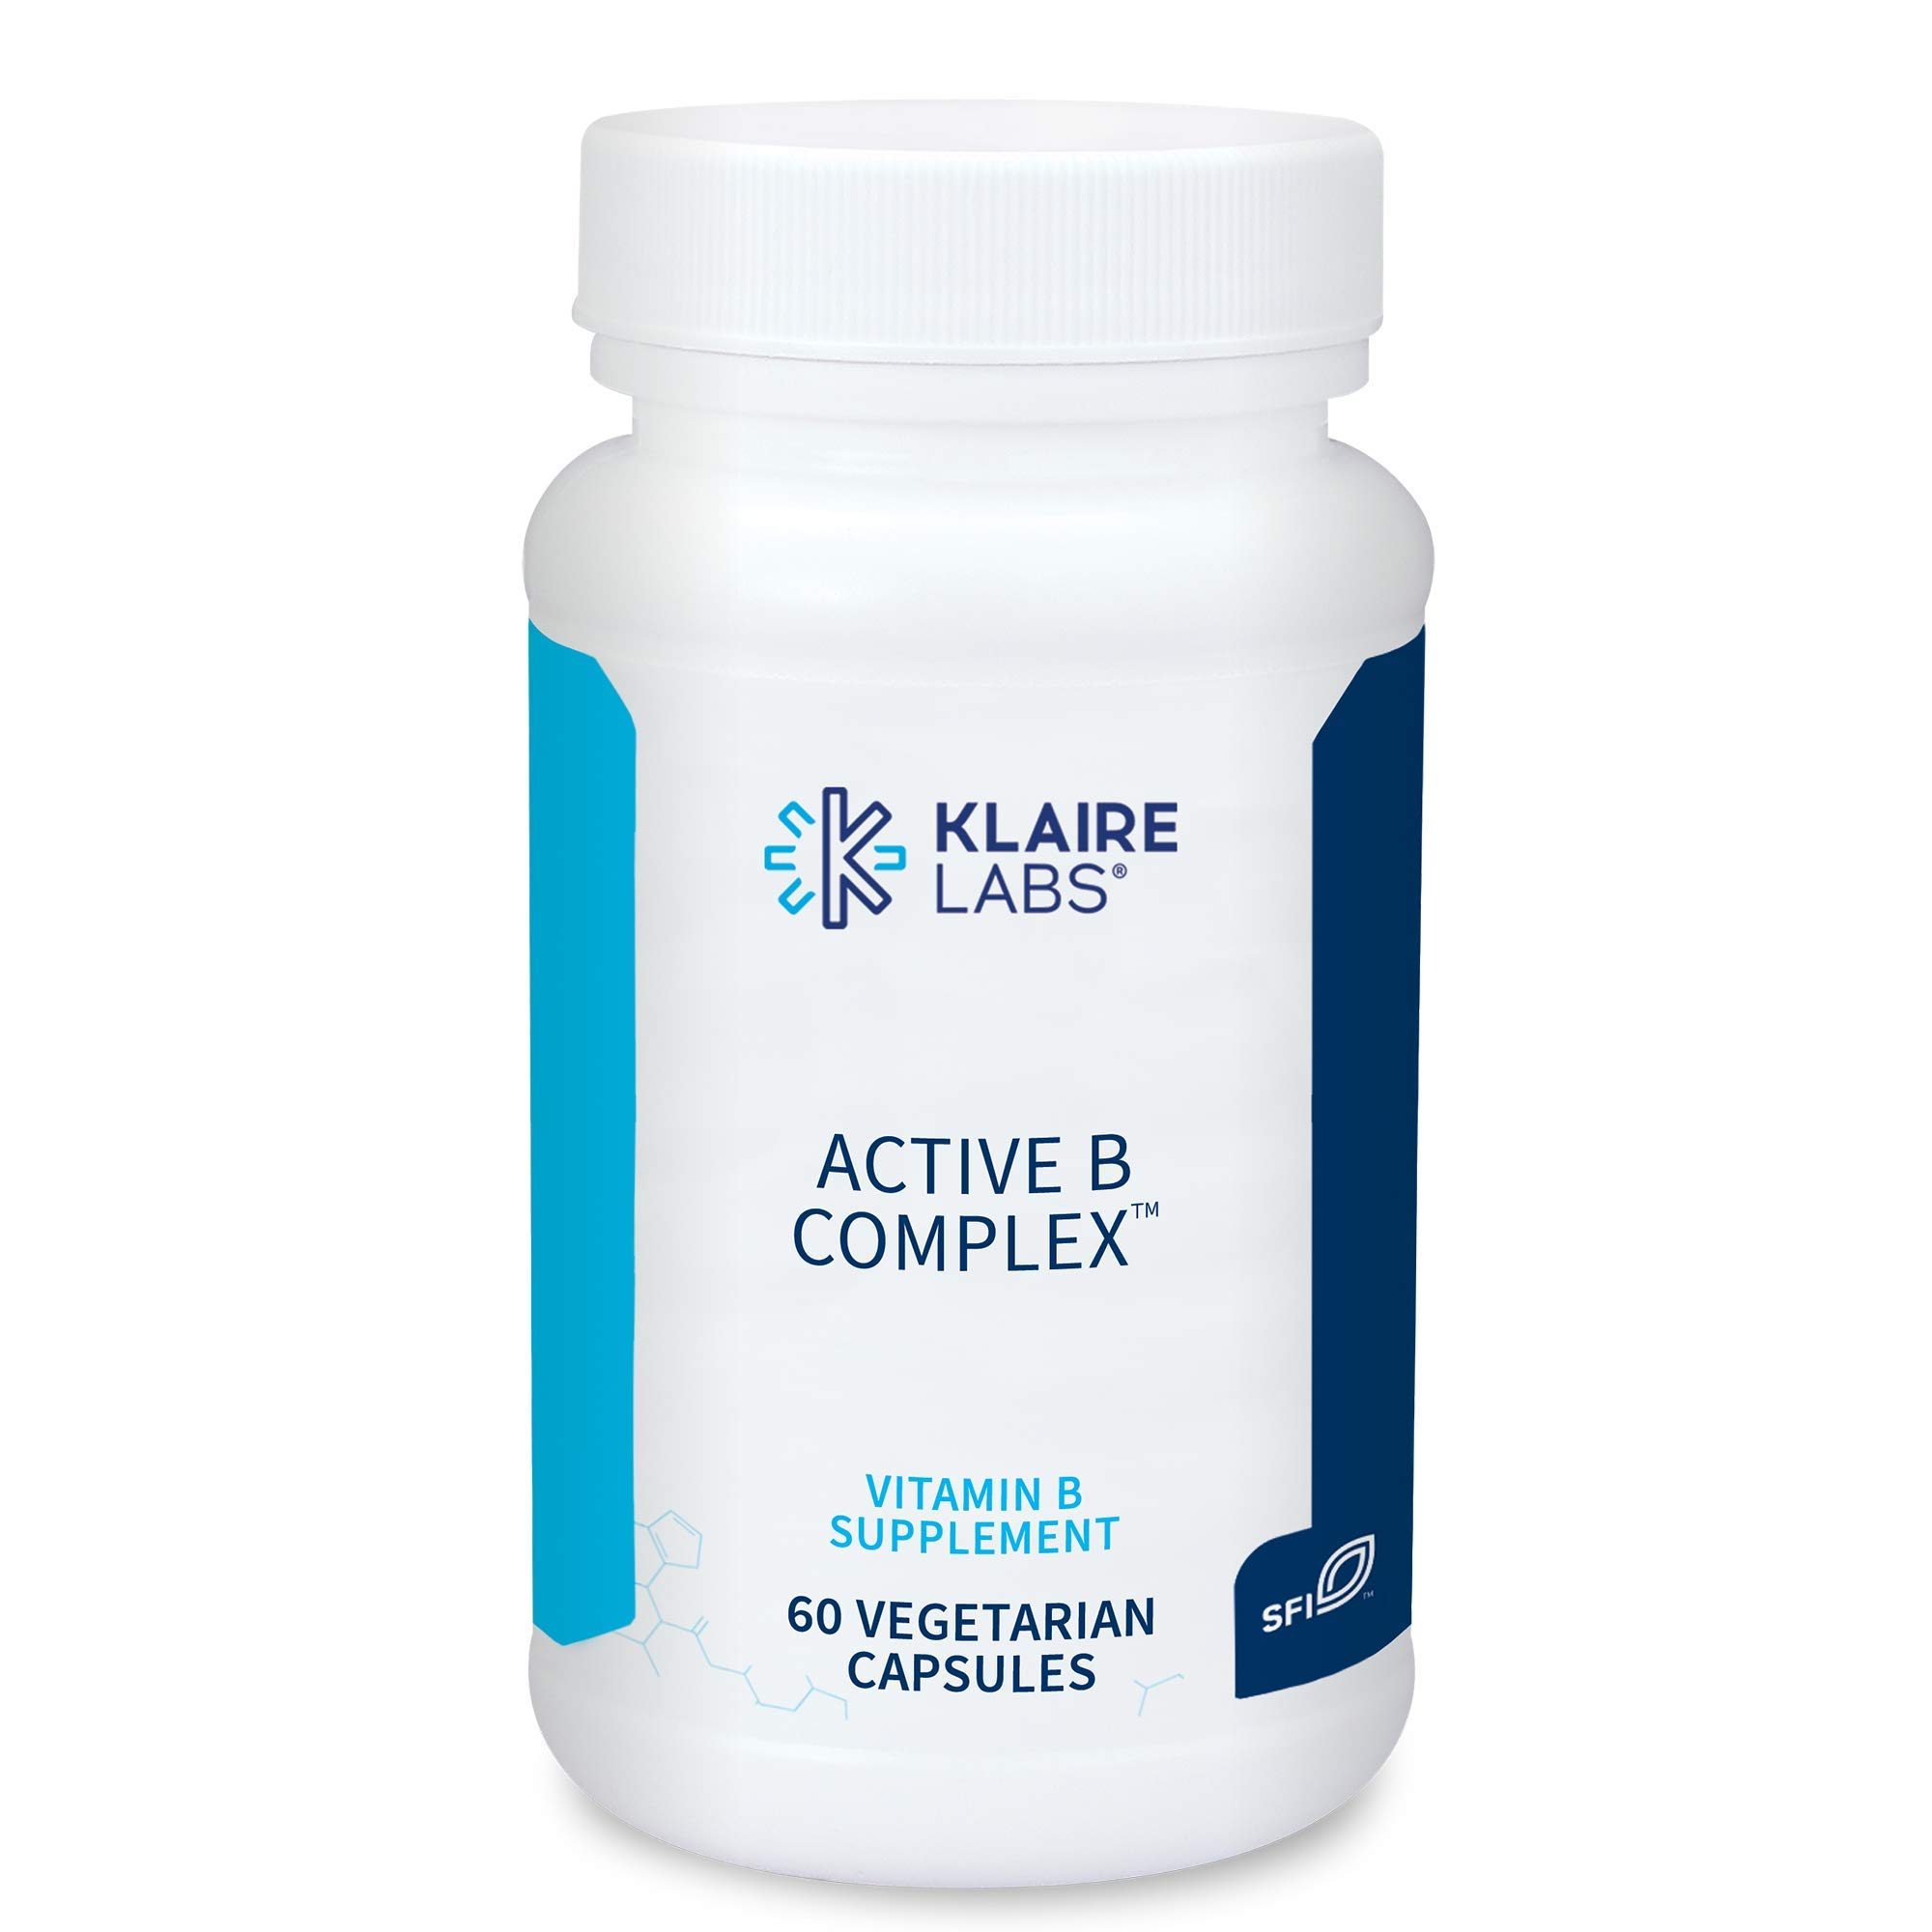 Klaire Labs Active B Complex - Energy & Mood Support B Vitamin Supplement with Metafolin Folate, Methylcobalamin B12, Biotin & VIT B6 - High Potency, Hypoallergenic B Vitamins (60 Capsules)